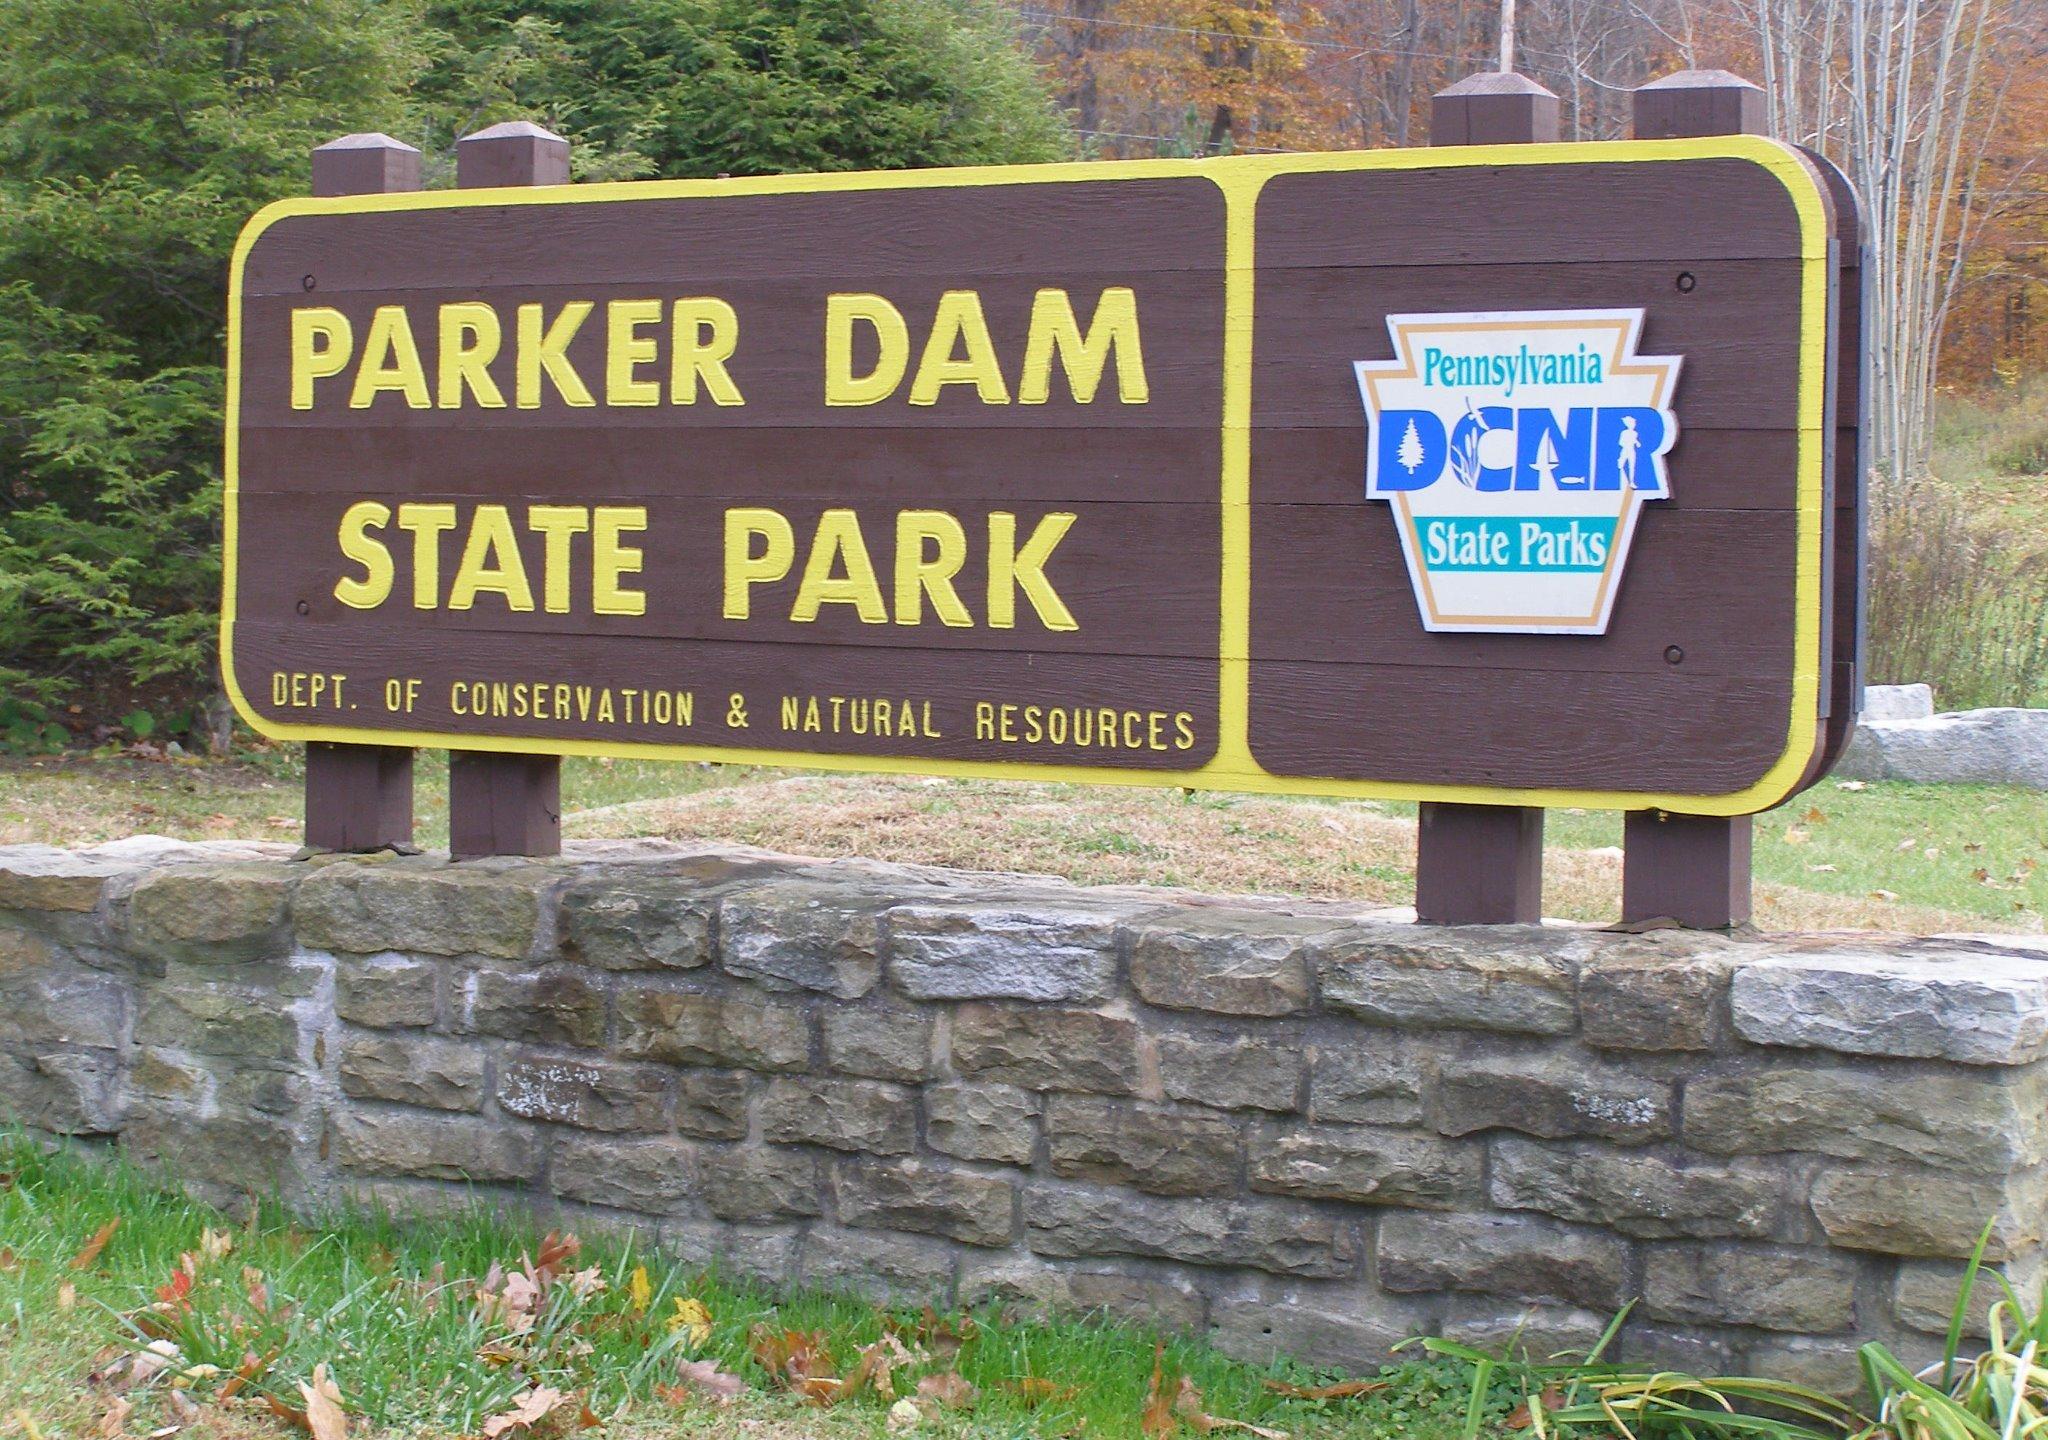 parker dam_1469046144584.jpg